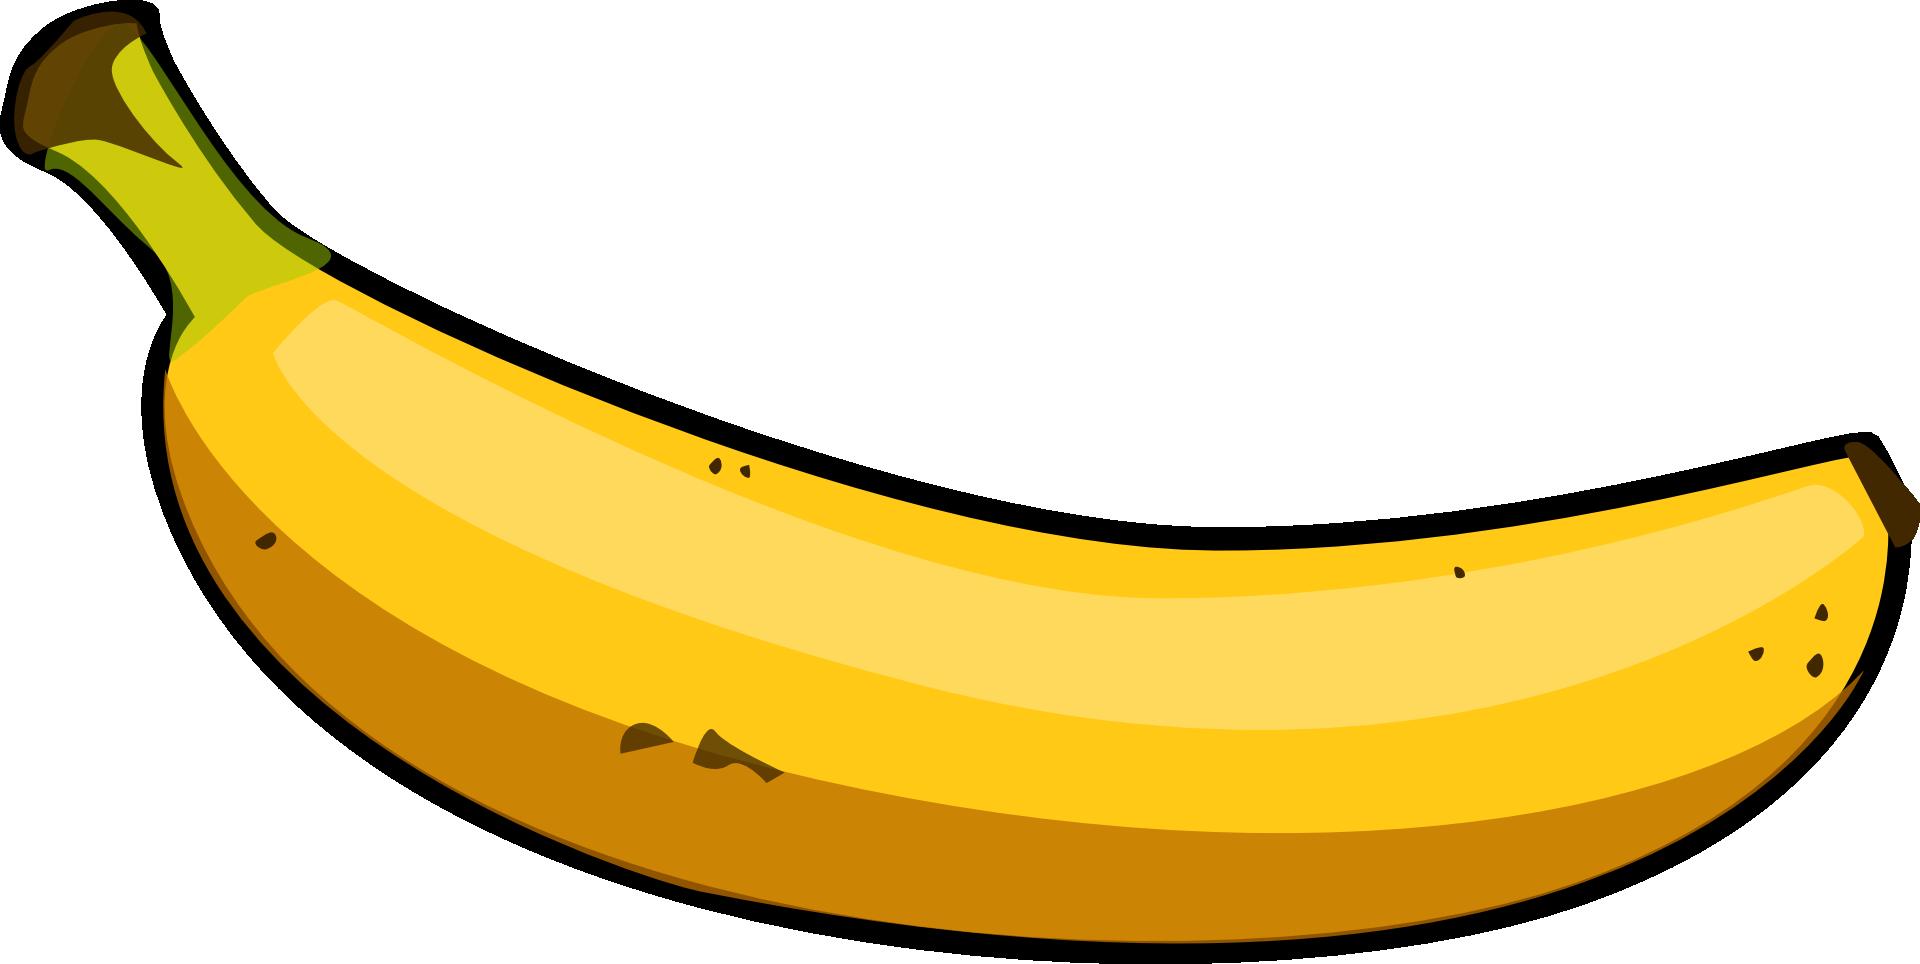 Free Banana Clip Art, Download Free Clip Art, Free Clip Art.